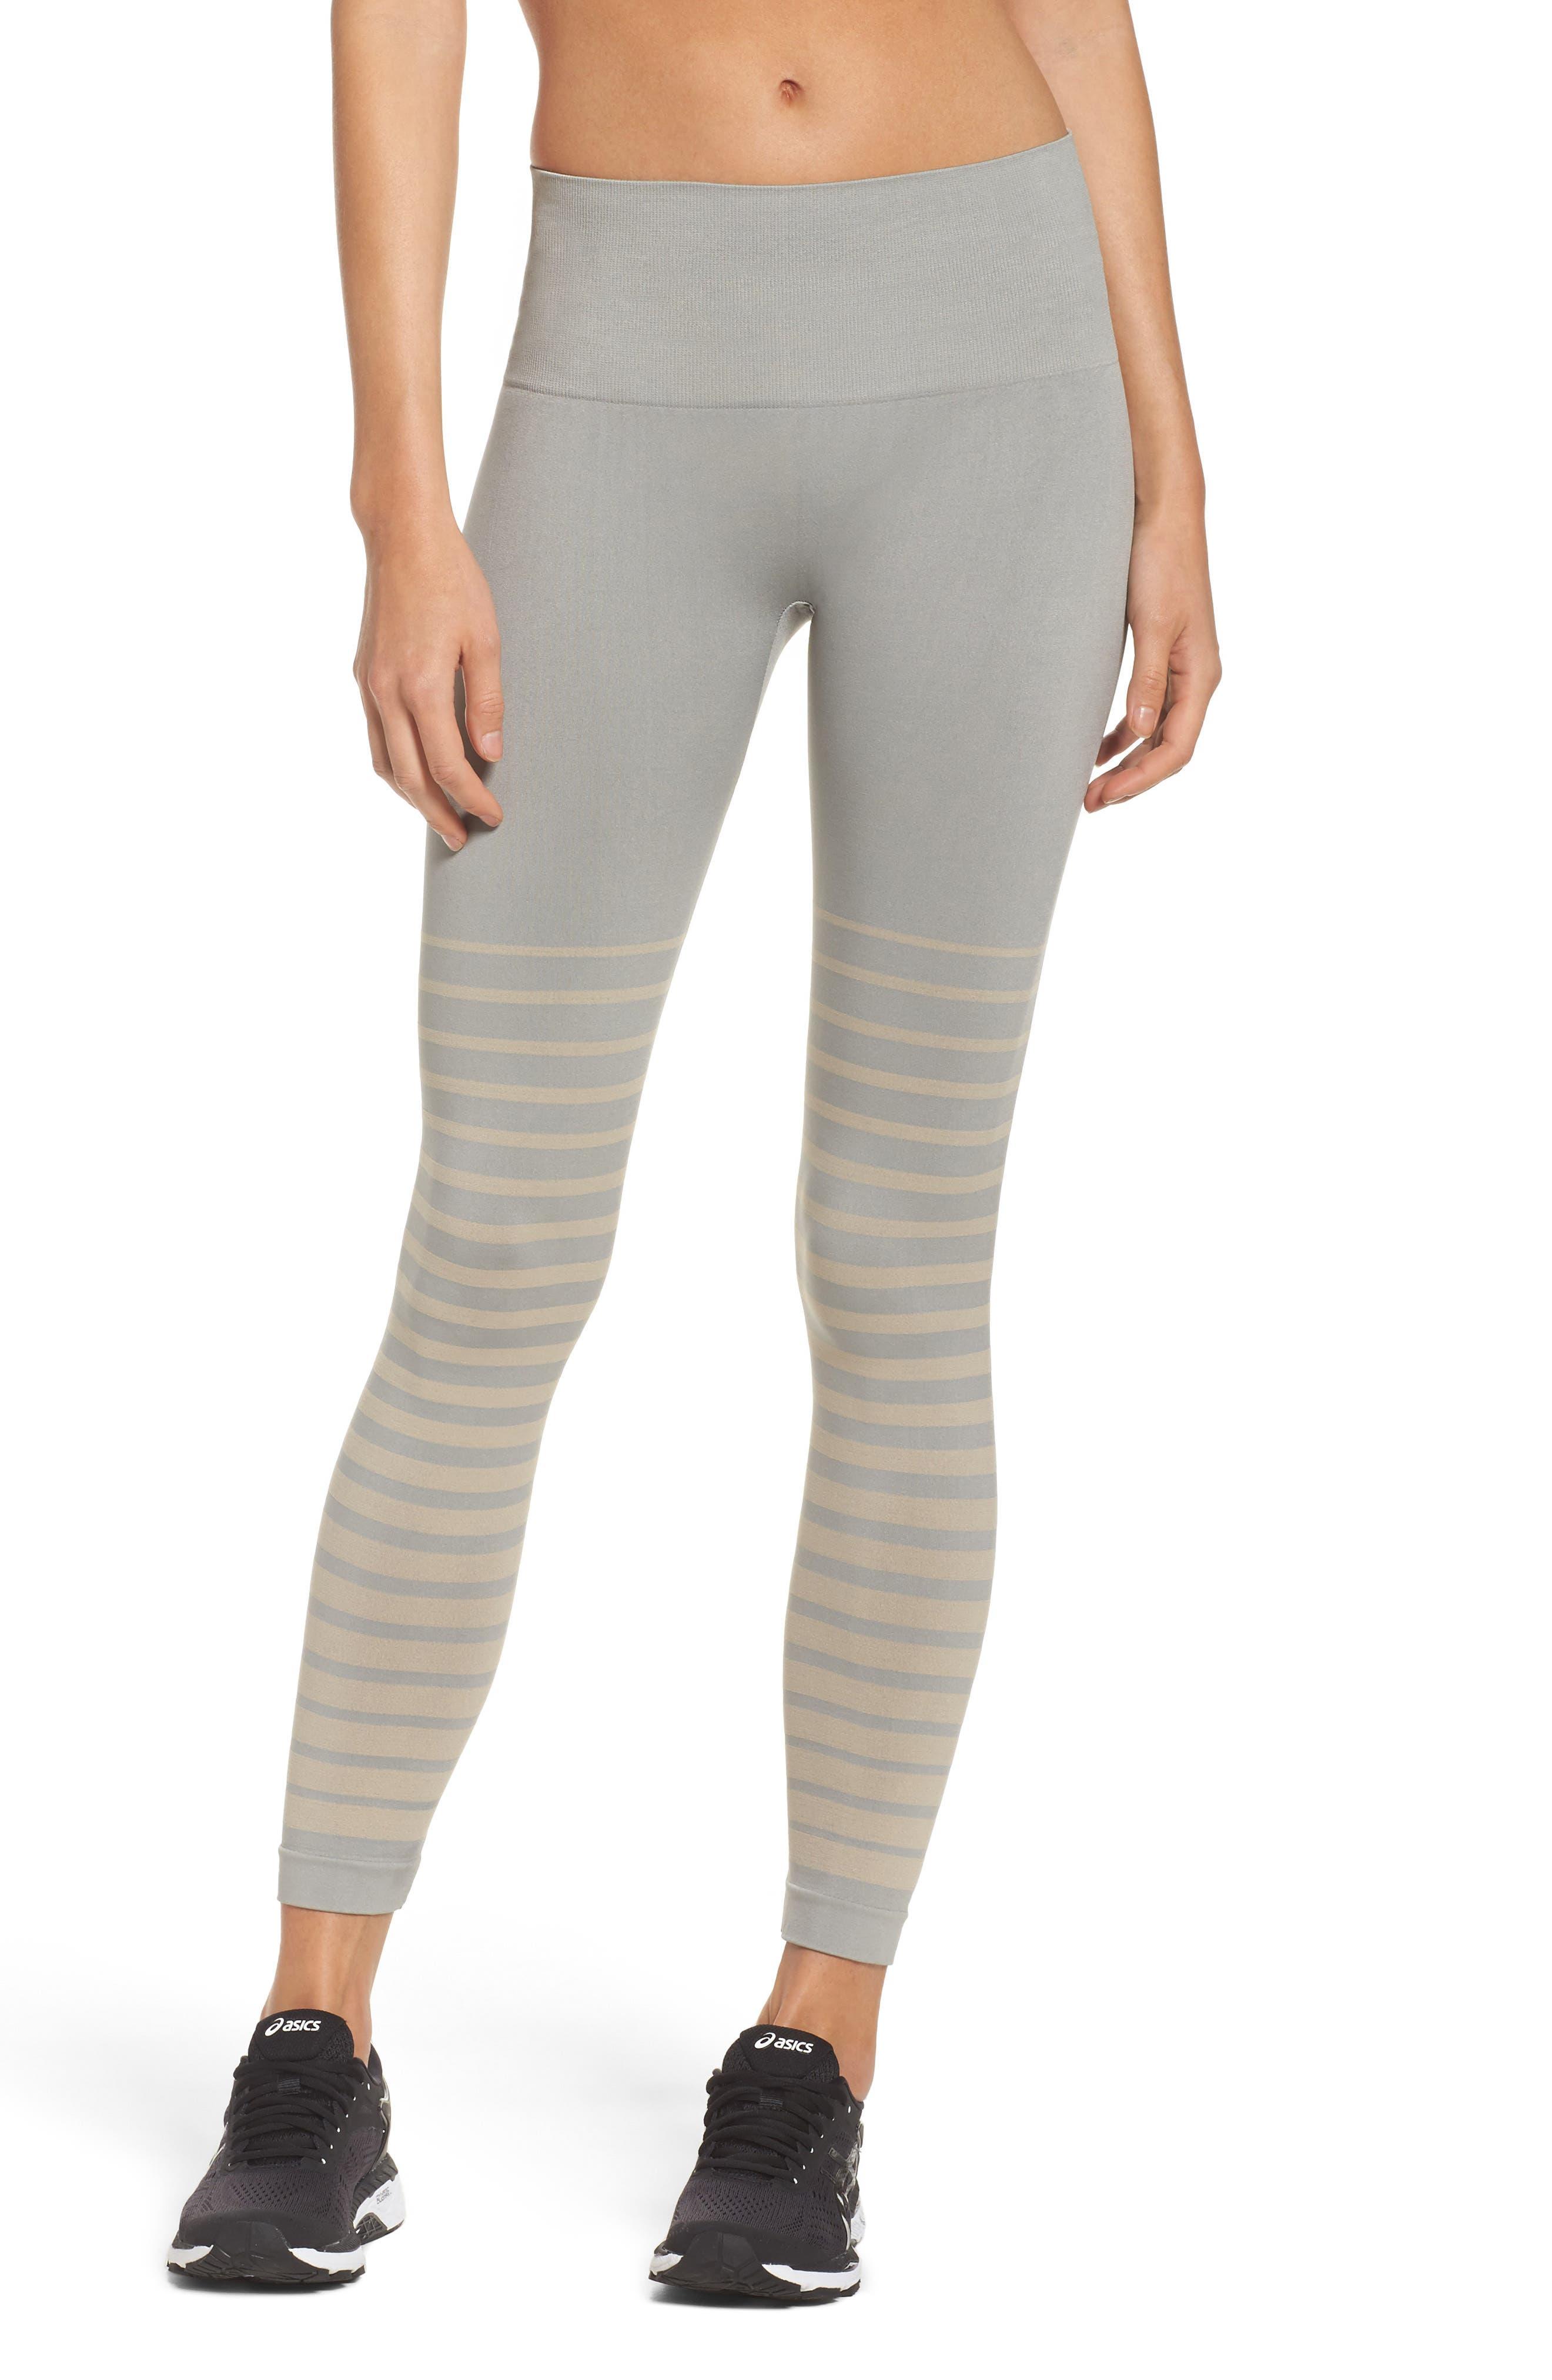 Main Image - Climawear Front Runner High Waist Leggings